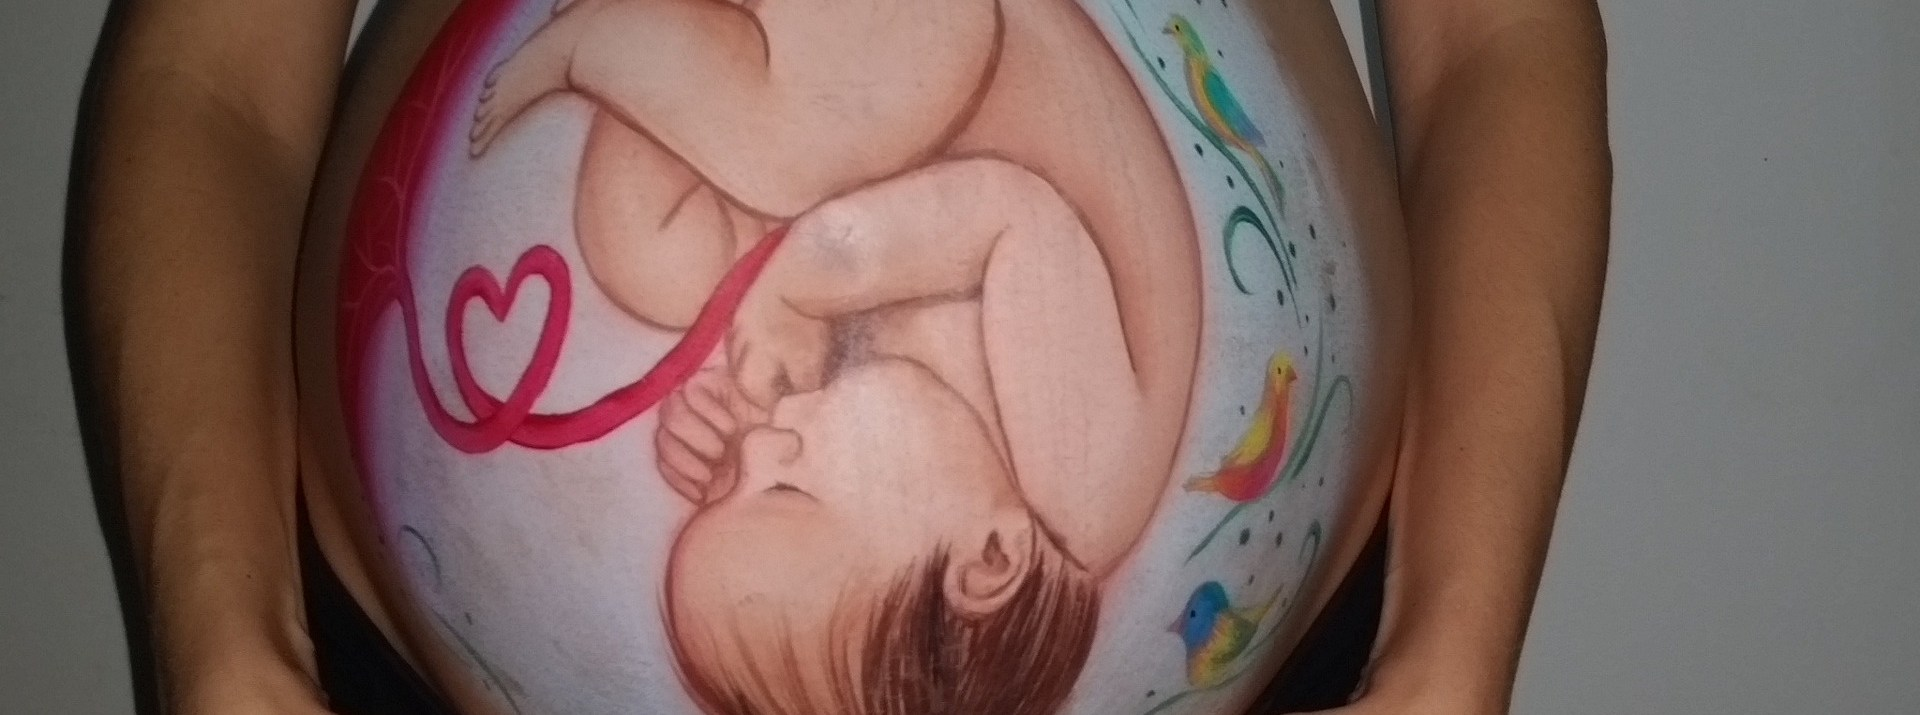 Maternité = Métamorphose